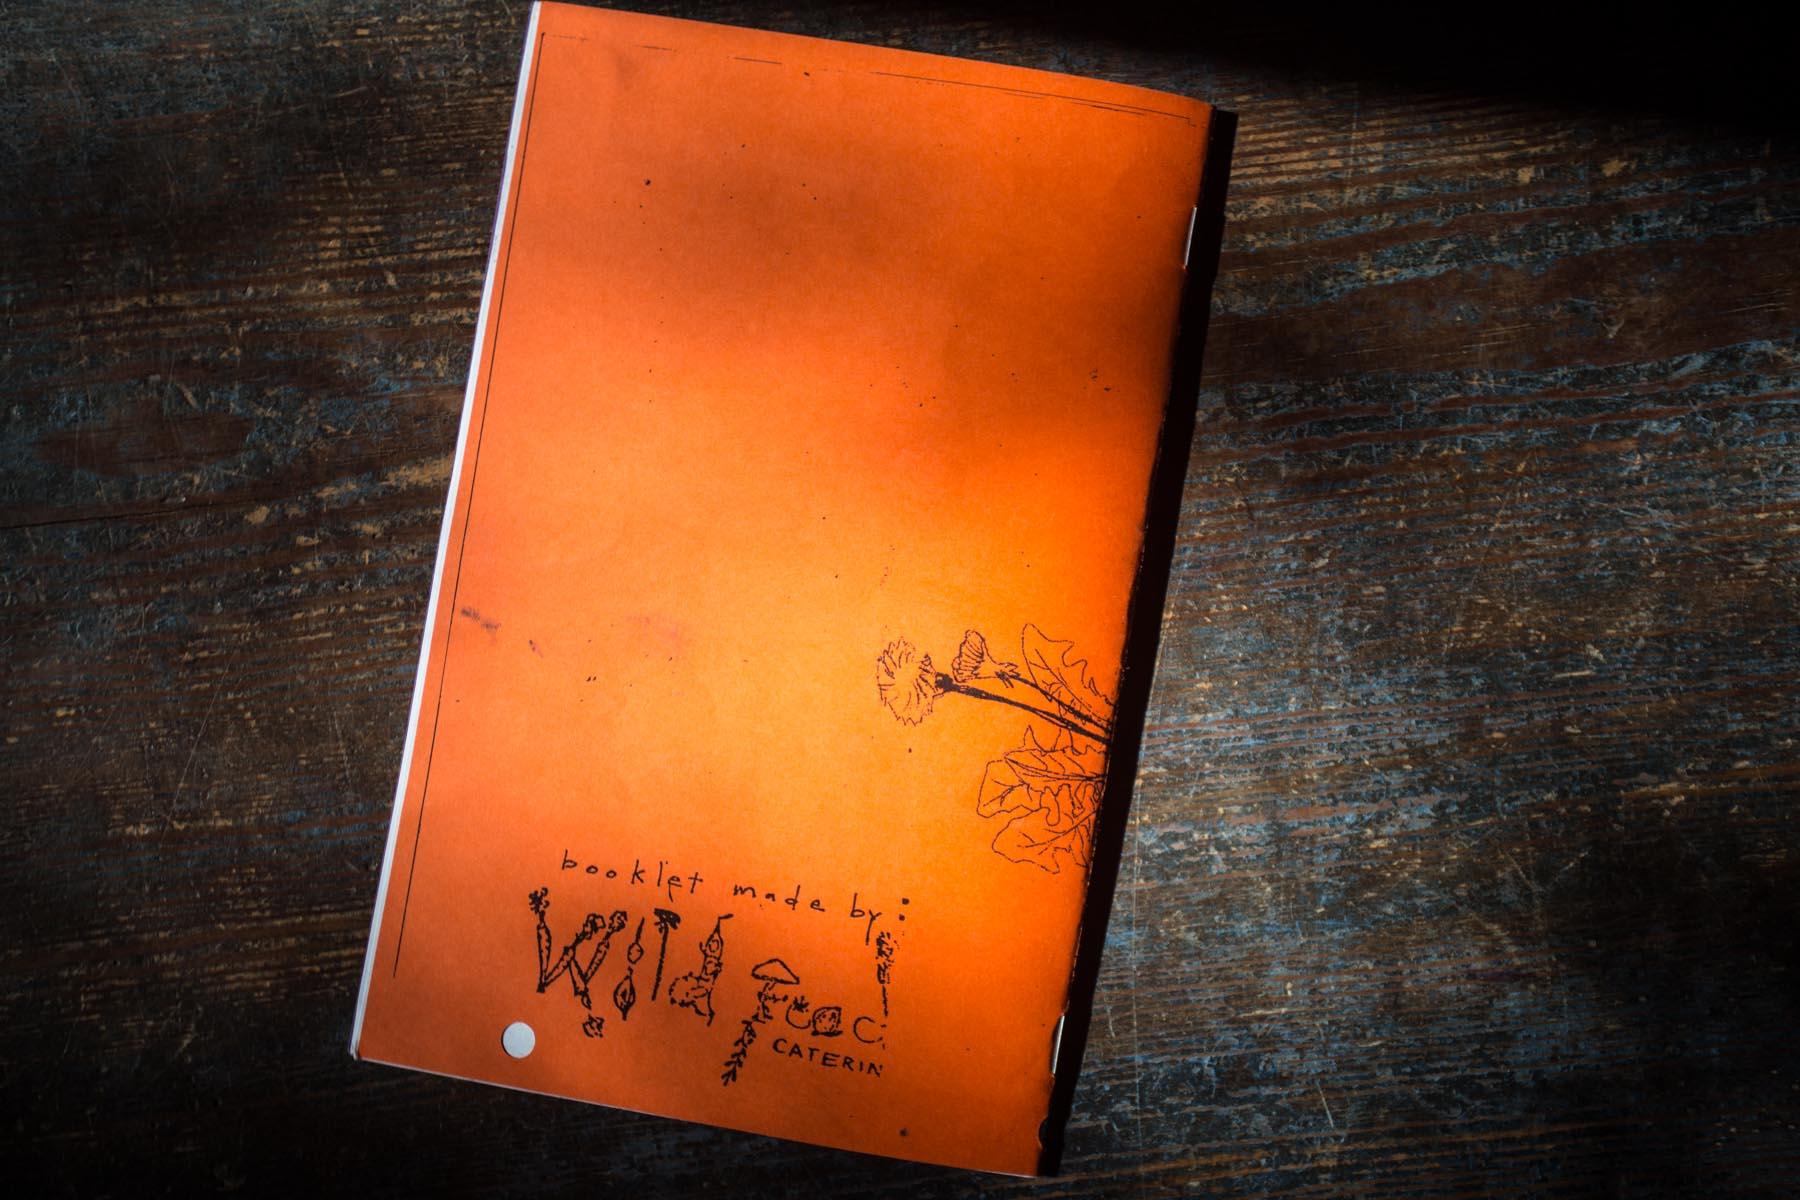 RA_wild food zine-201605230980.jpg